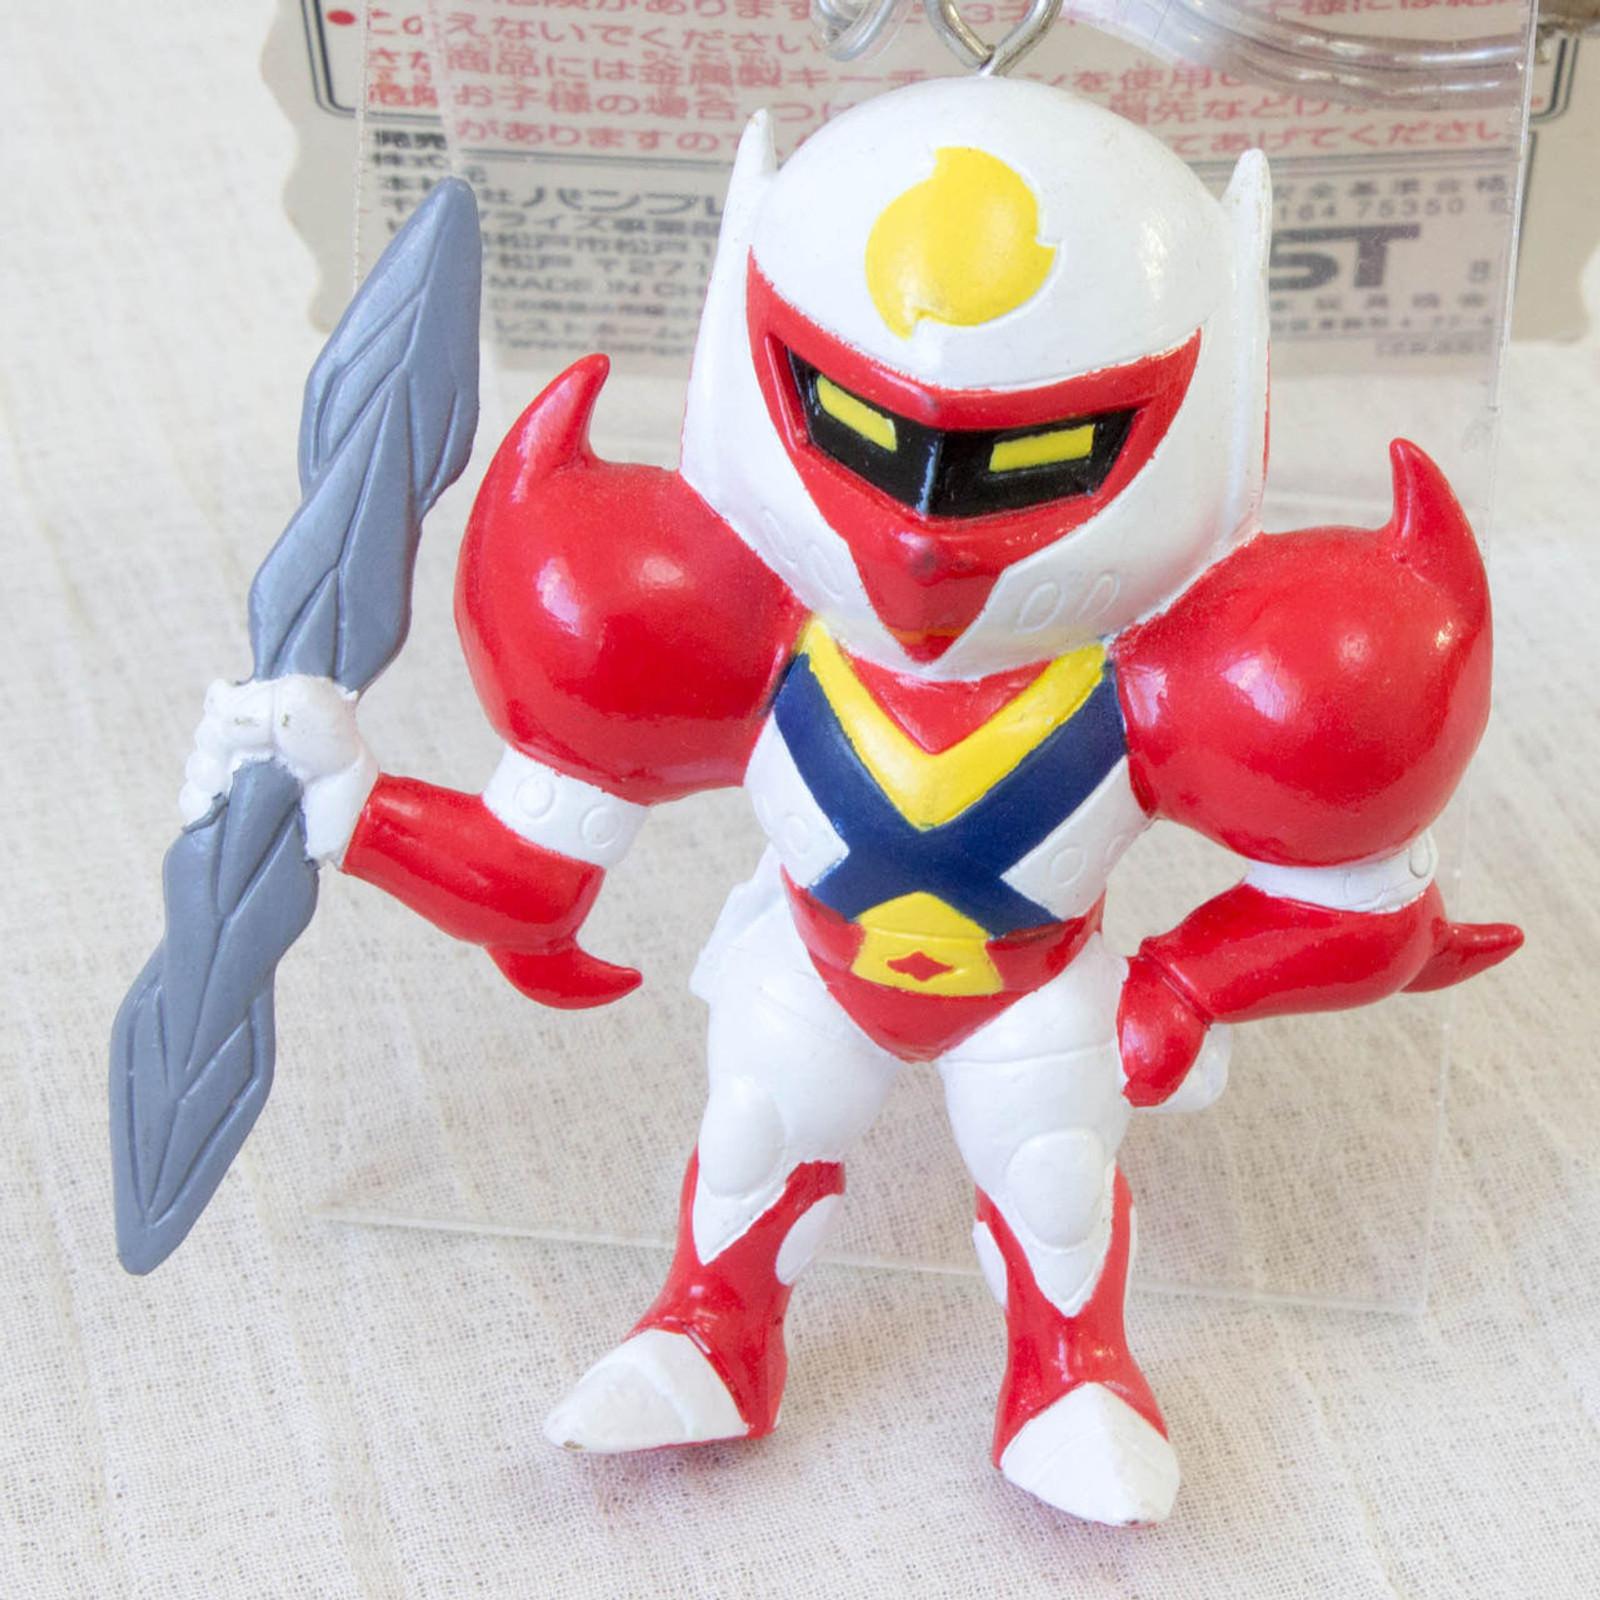 Tekkaman The Space Knight Figure Key Chain Tatsunoko Pro JAPAN ANIME MANGA